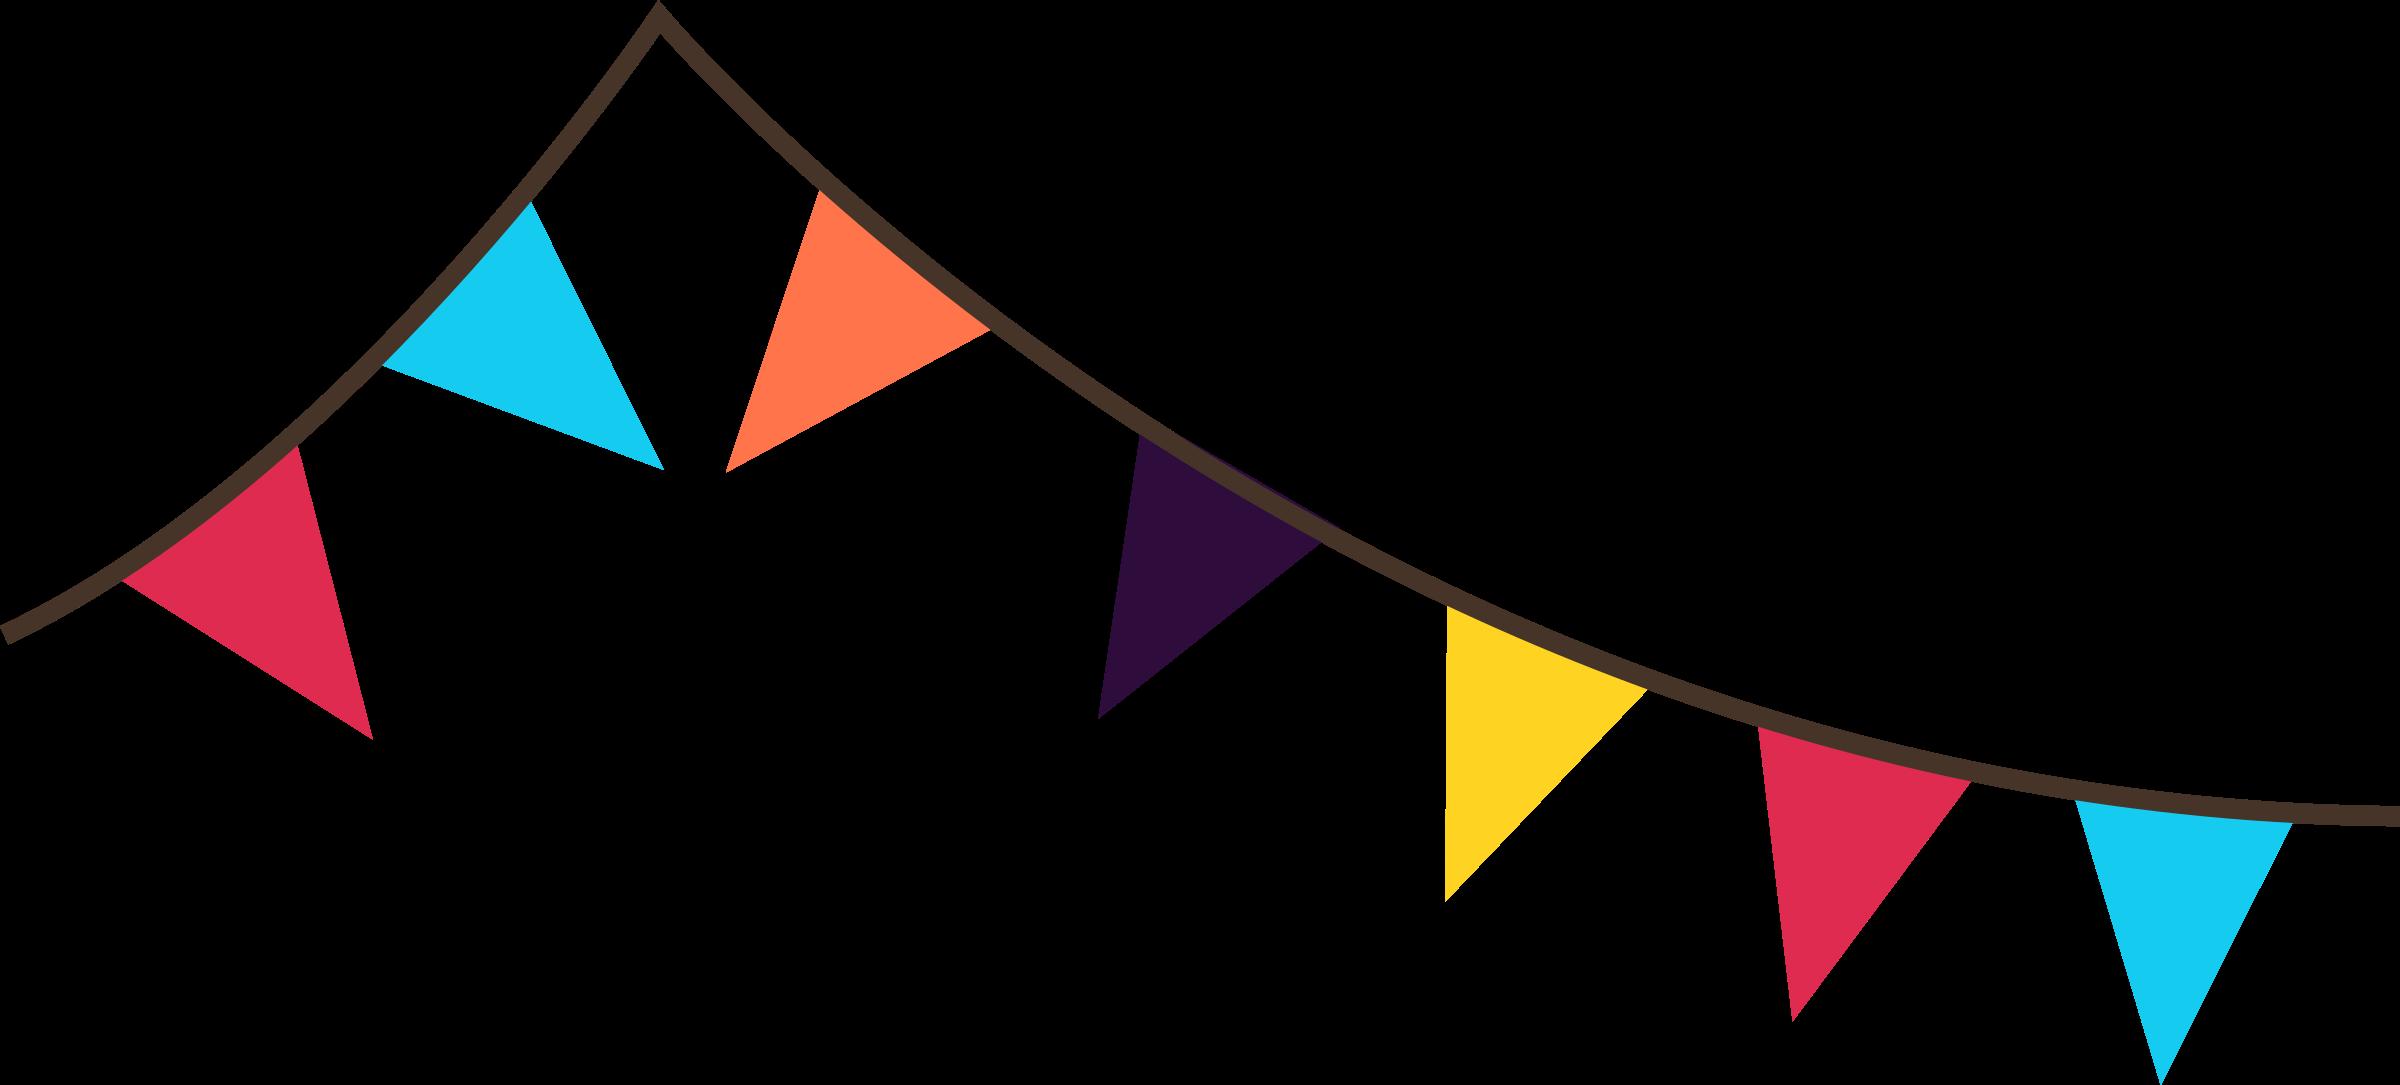 2400x1085 Decoration Clipart Party Flag